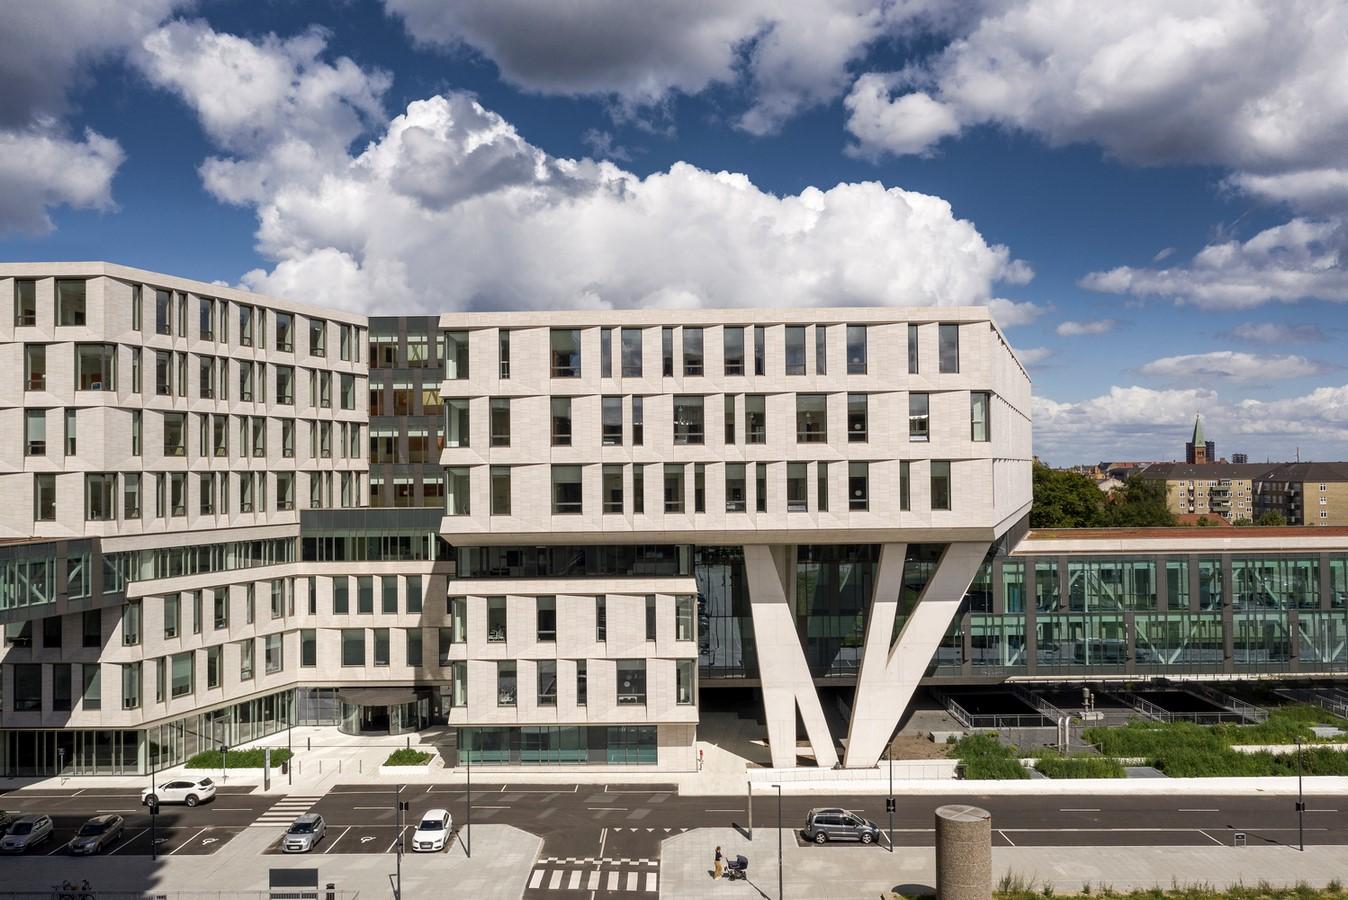 Rigshospitalet Hospital North Wing, Denmark (2020) - Sheet2